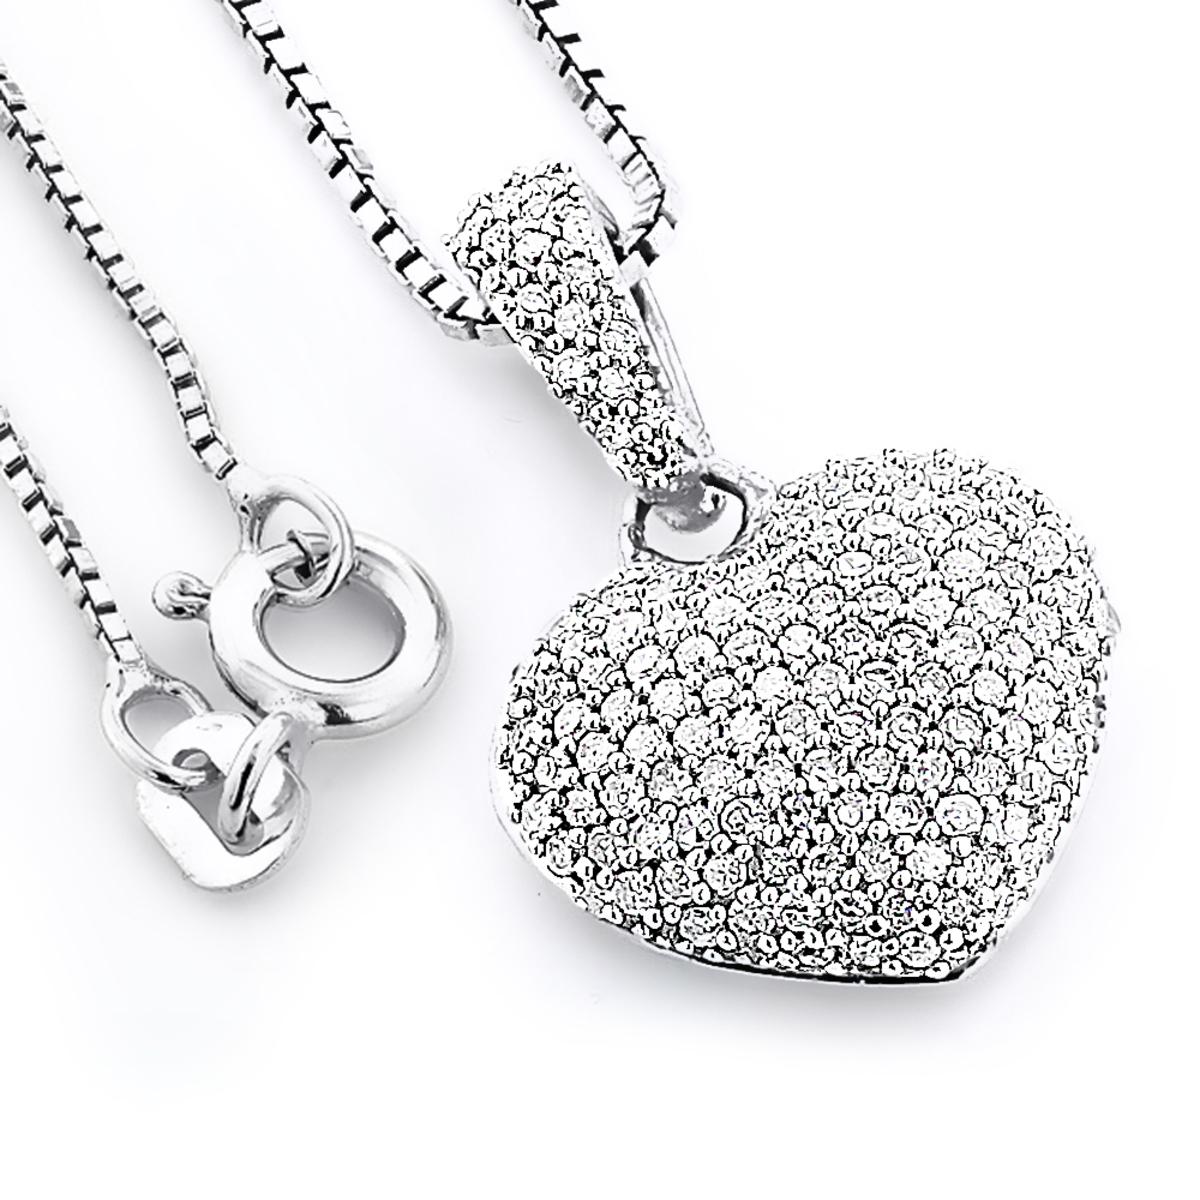 Pave Diamond Heart Pendant 0.48ct Sterling Silver